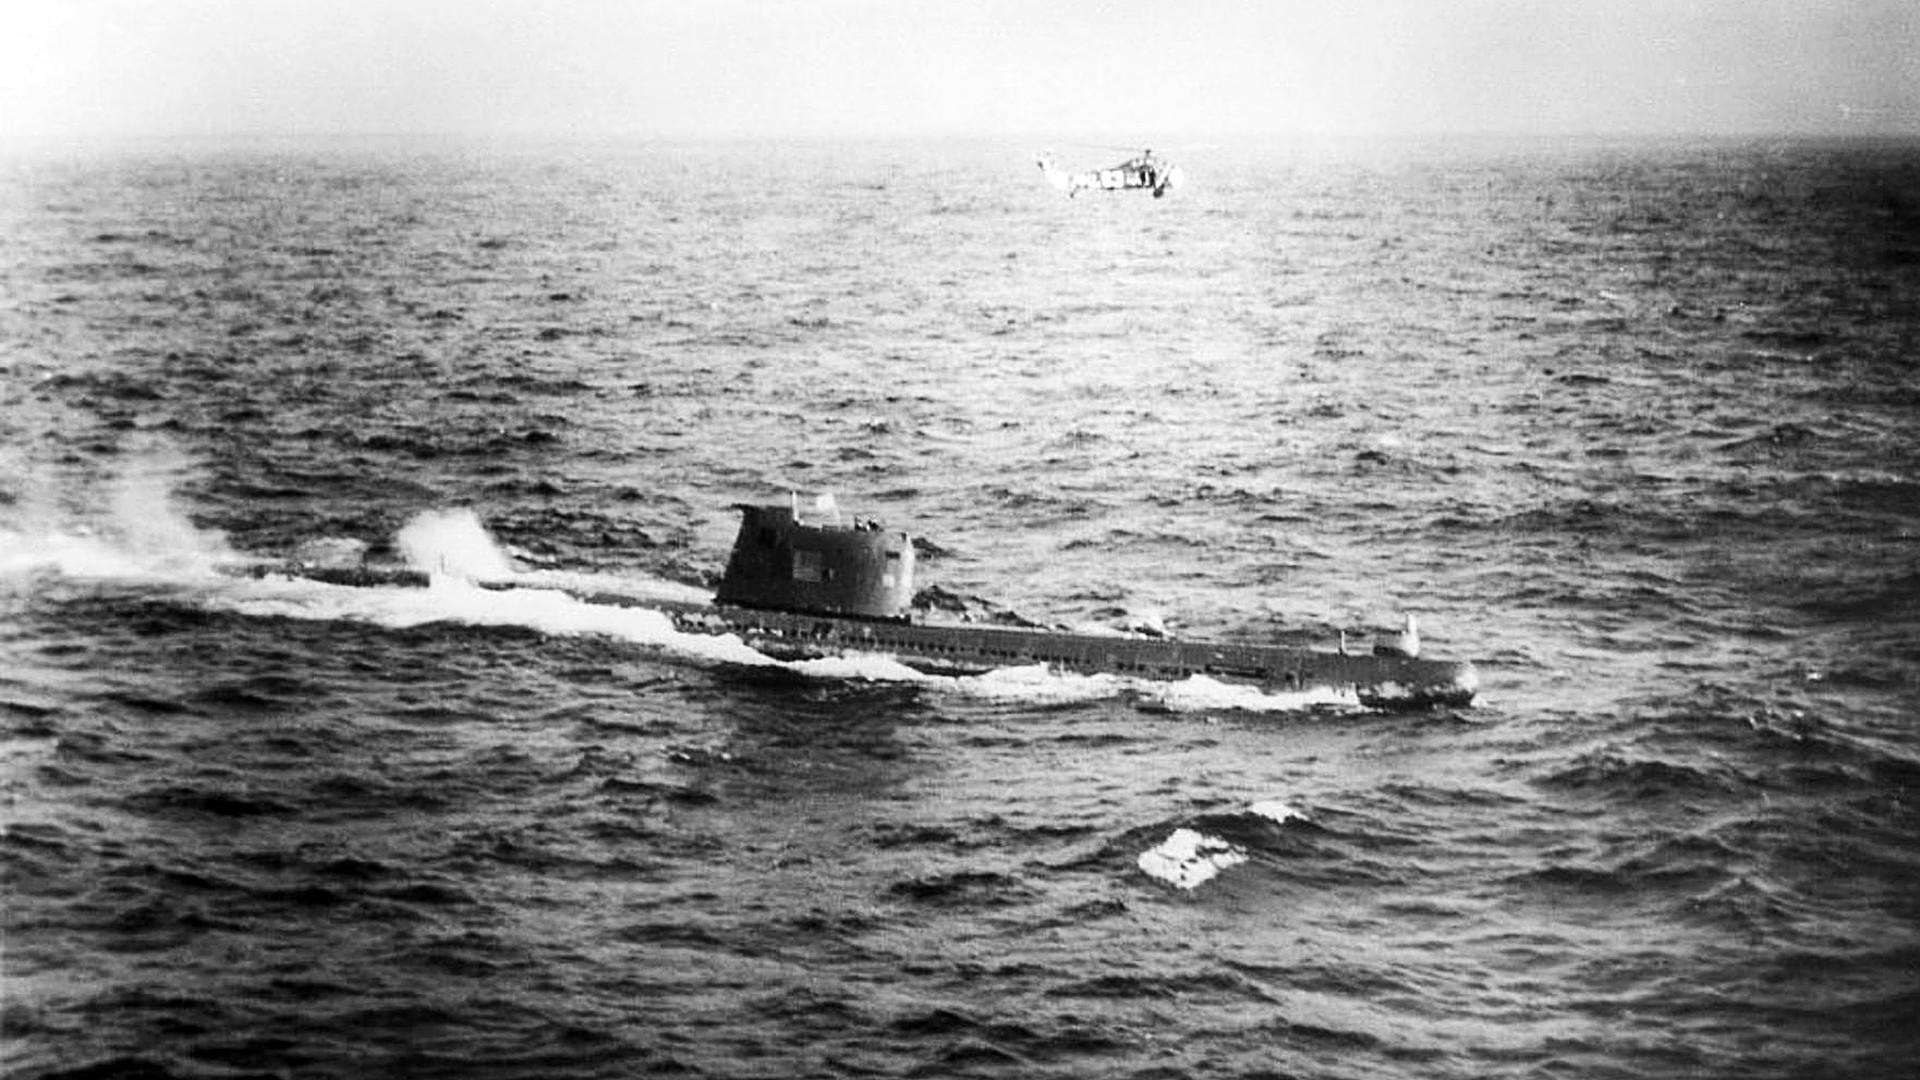 Soviet submarine B-59, in the Caribbean near Cuba.